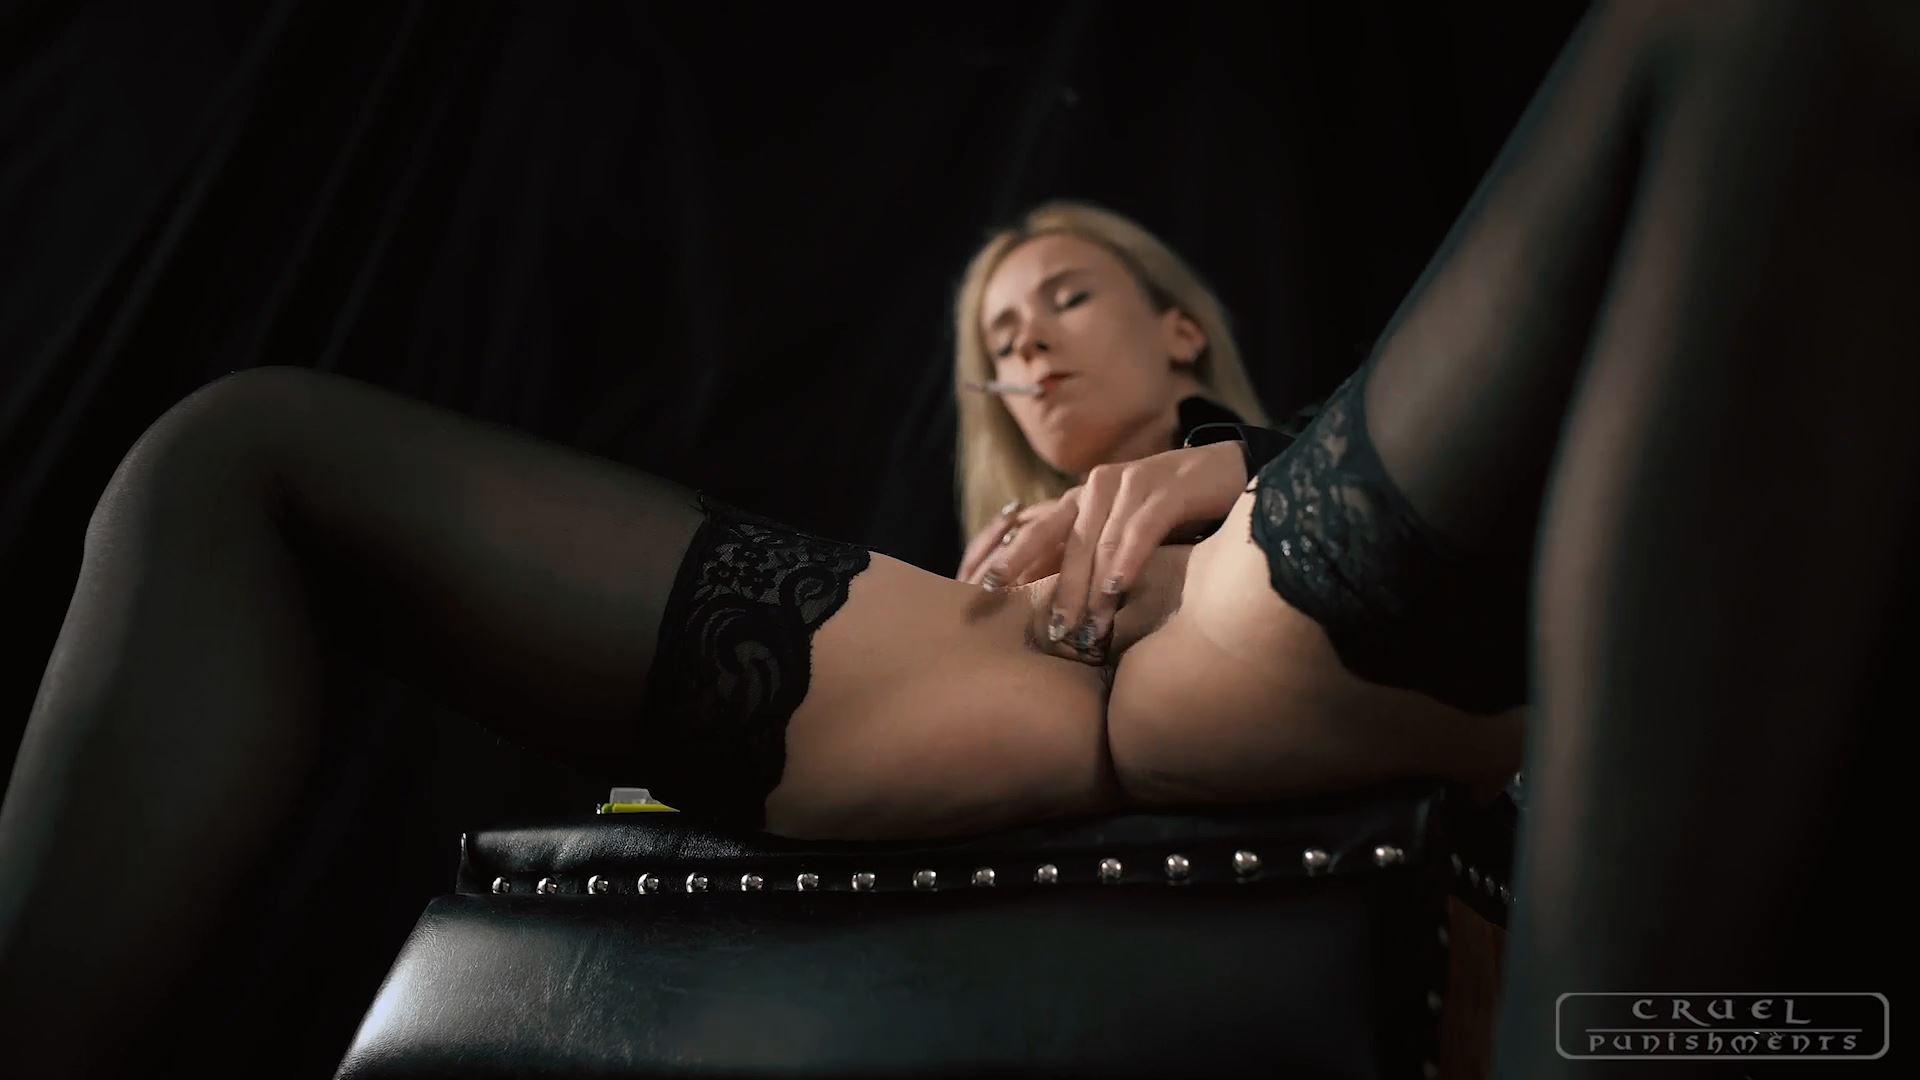 Mistress Anette In Scene: When nobody sees - CRUEL PUNISHMENTS - SEVERE FEMDOM - FULL HD/1080p/MP4